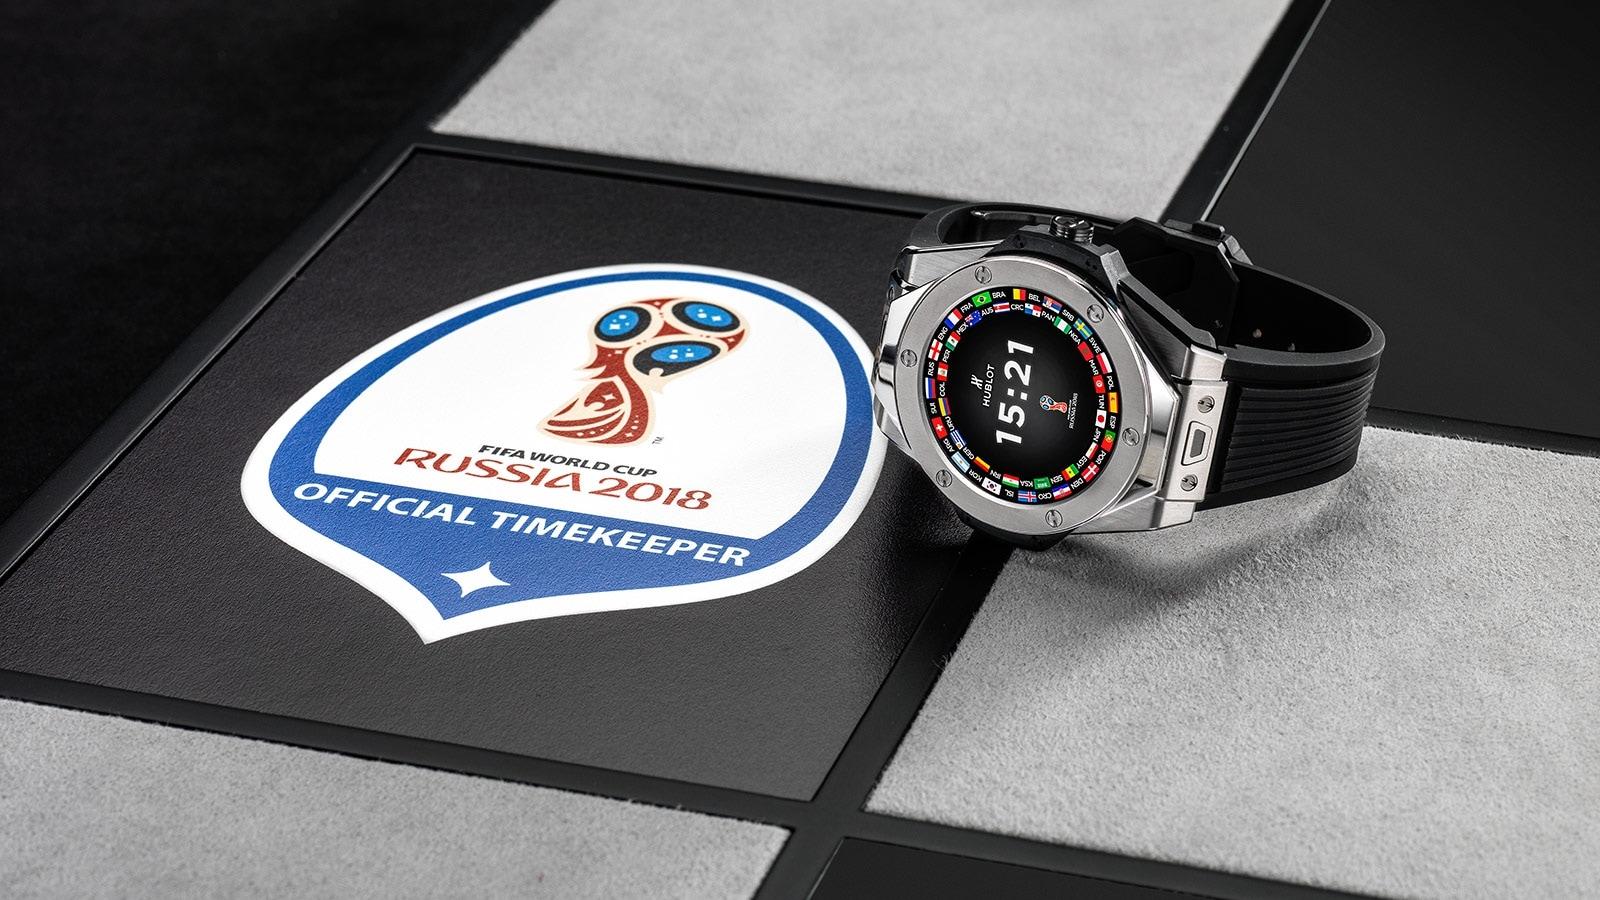 hublot-big-bang-referee-fifa-mondiali-2018-1